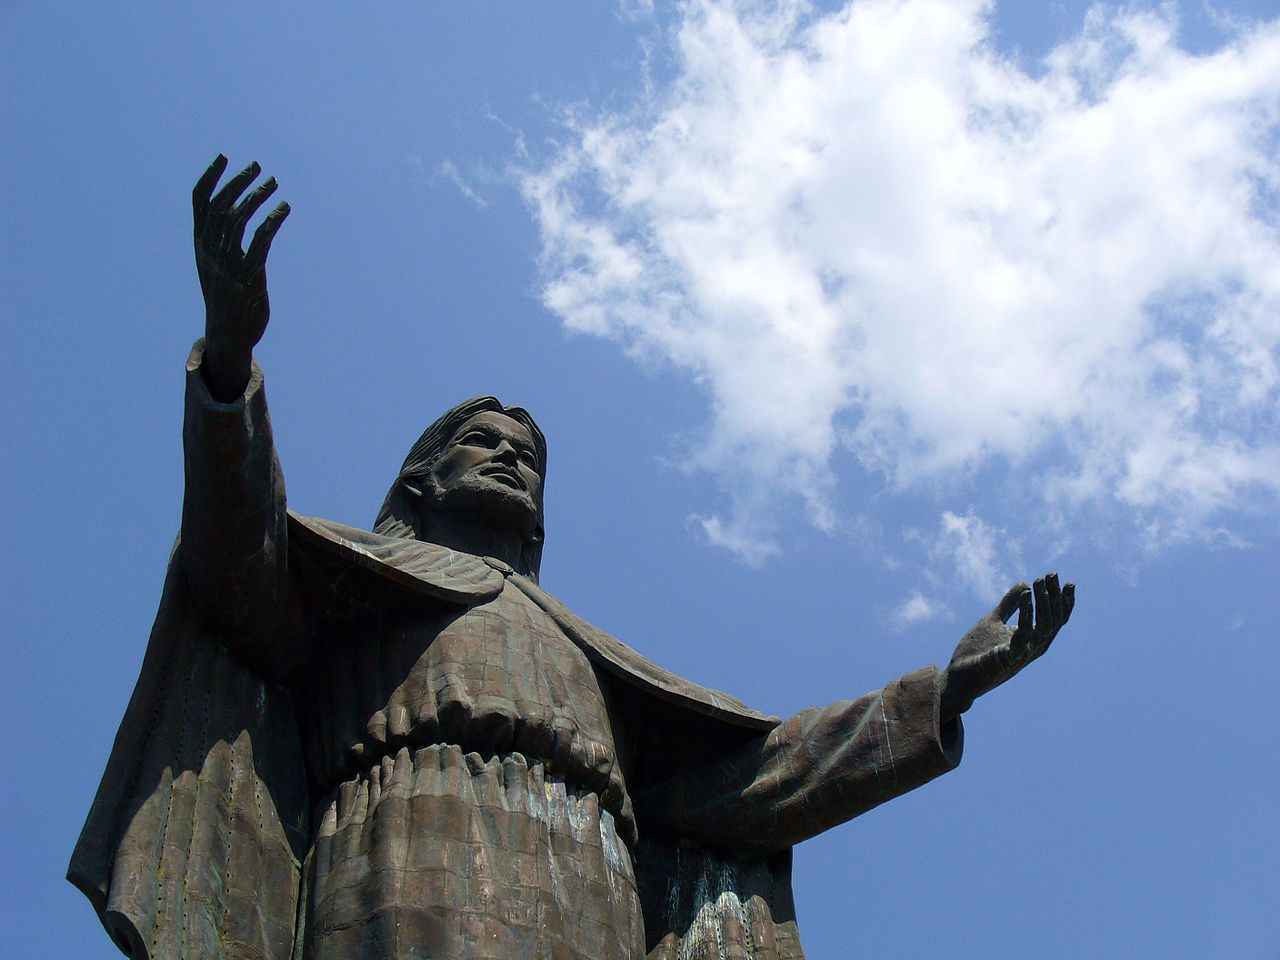 cristo rei timor leste